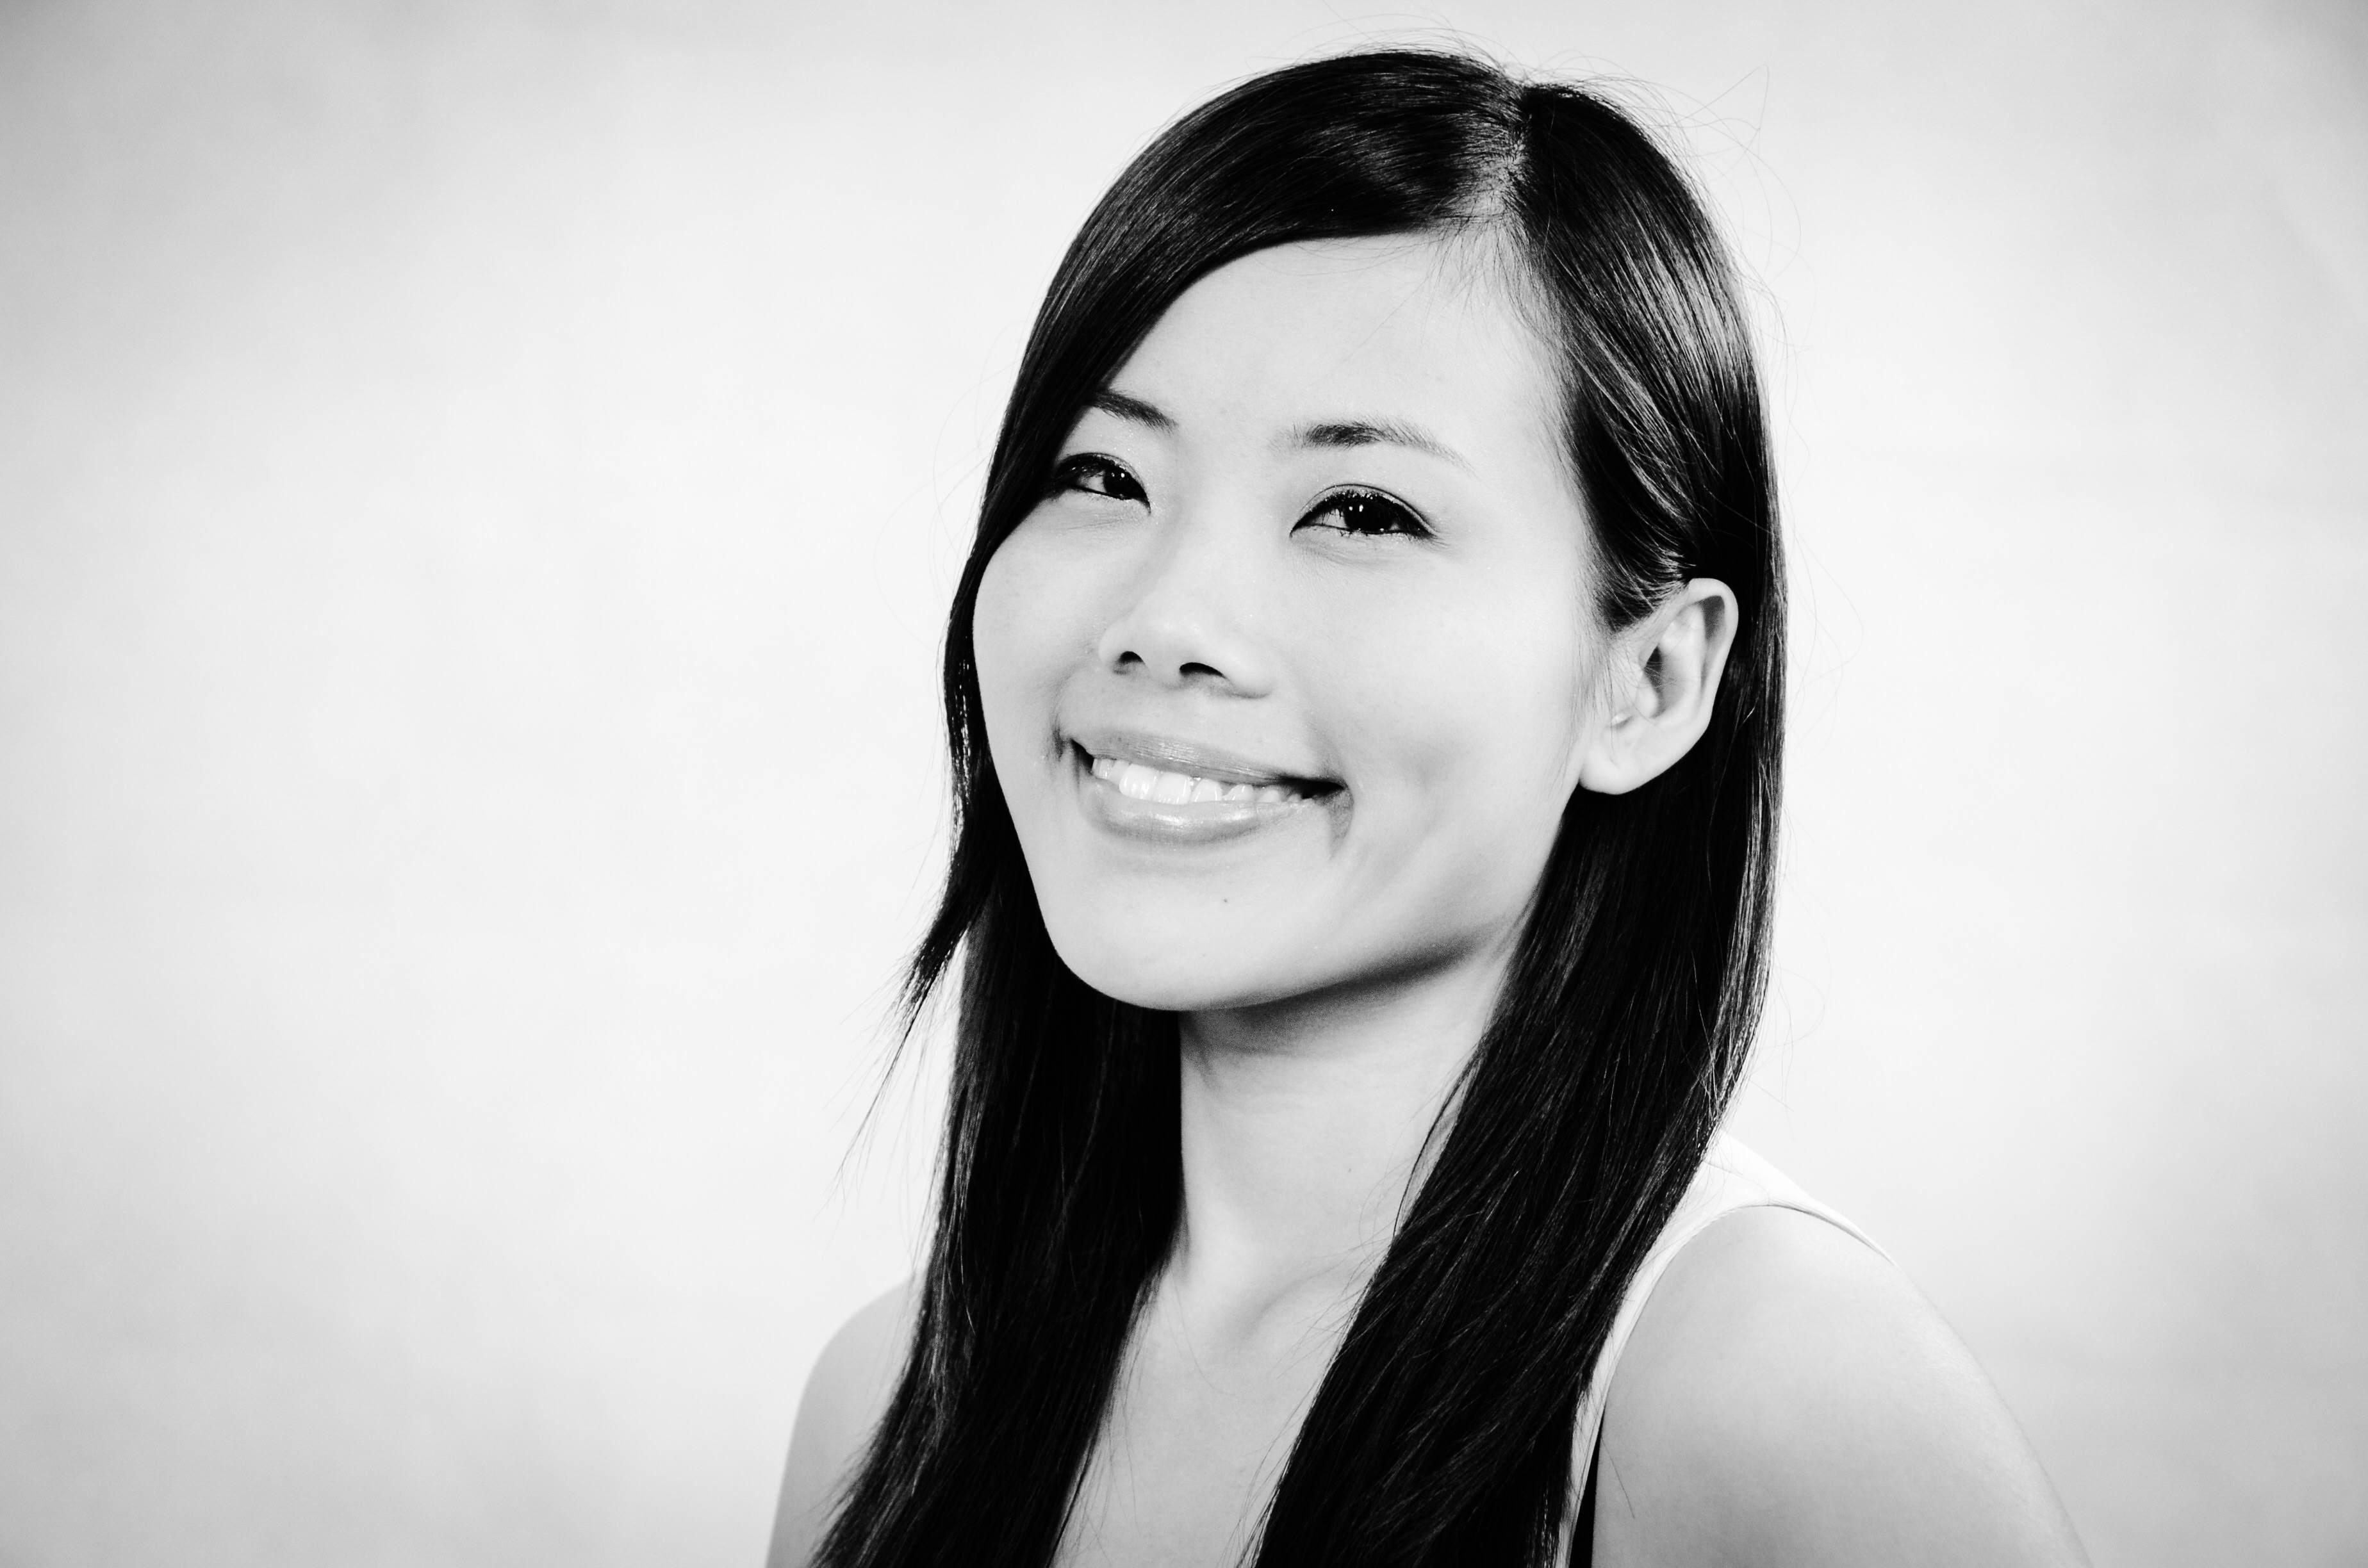 Elaine Tiu